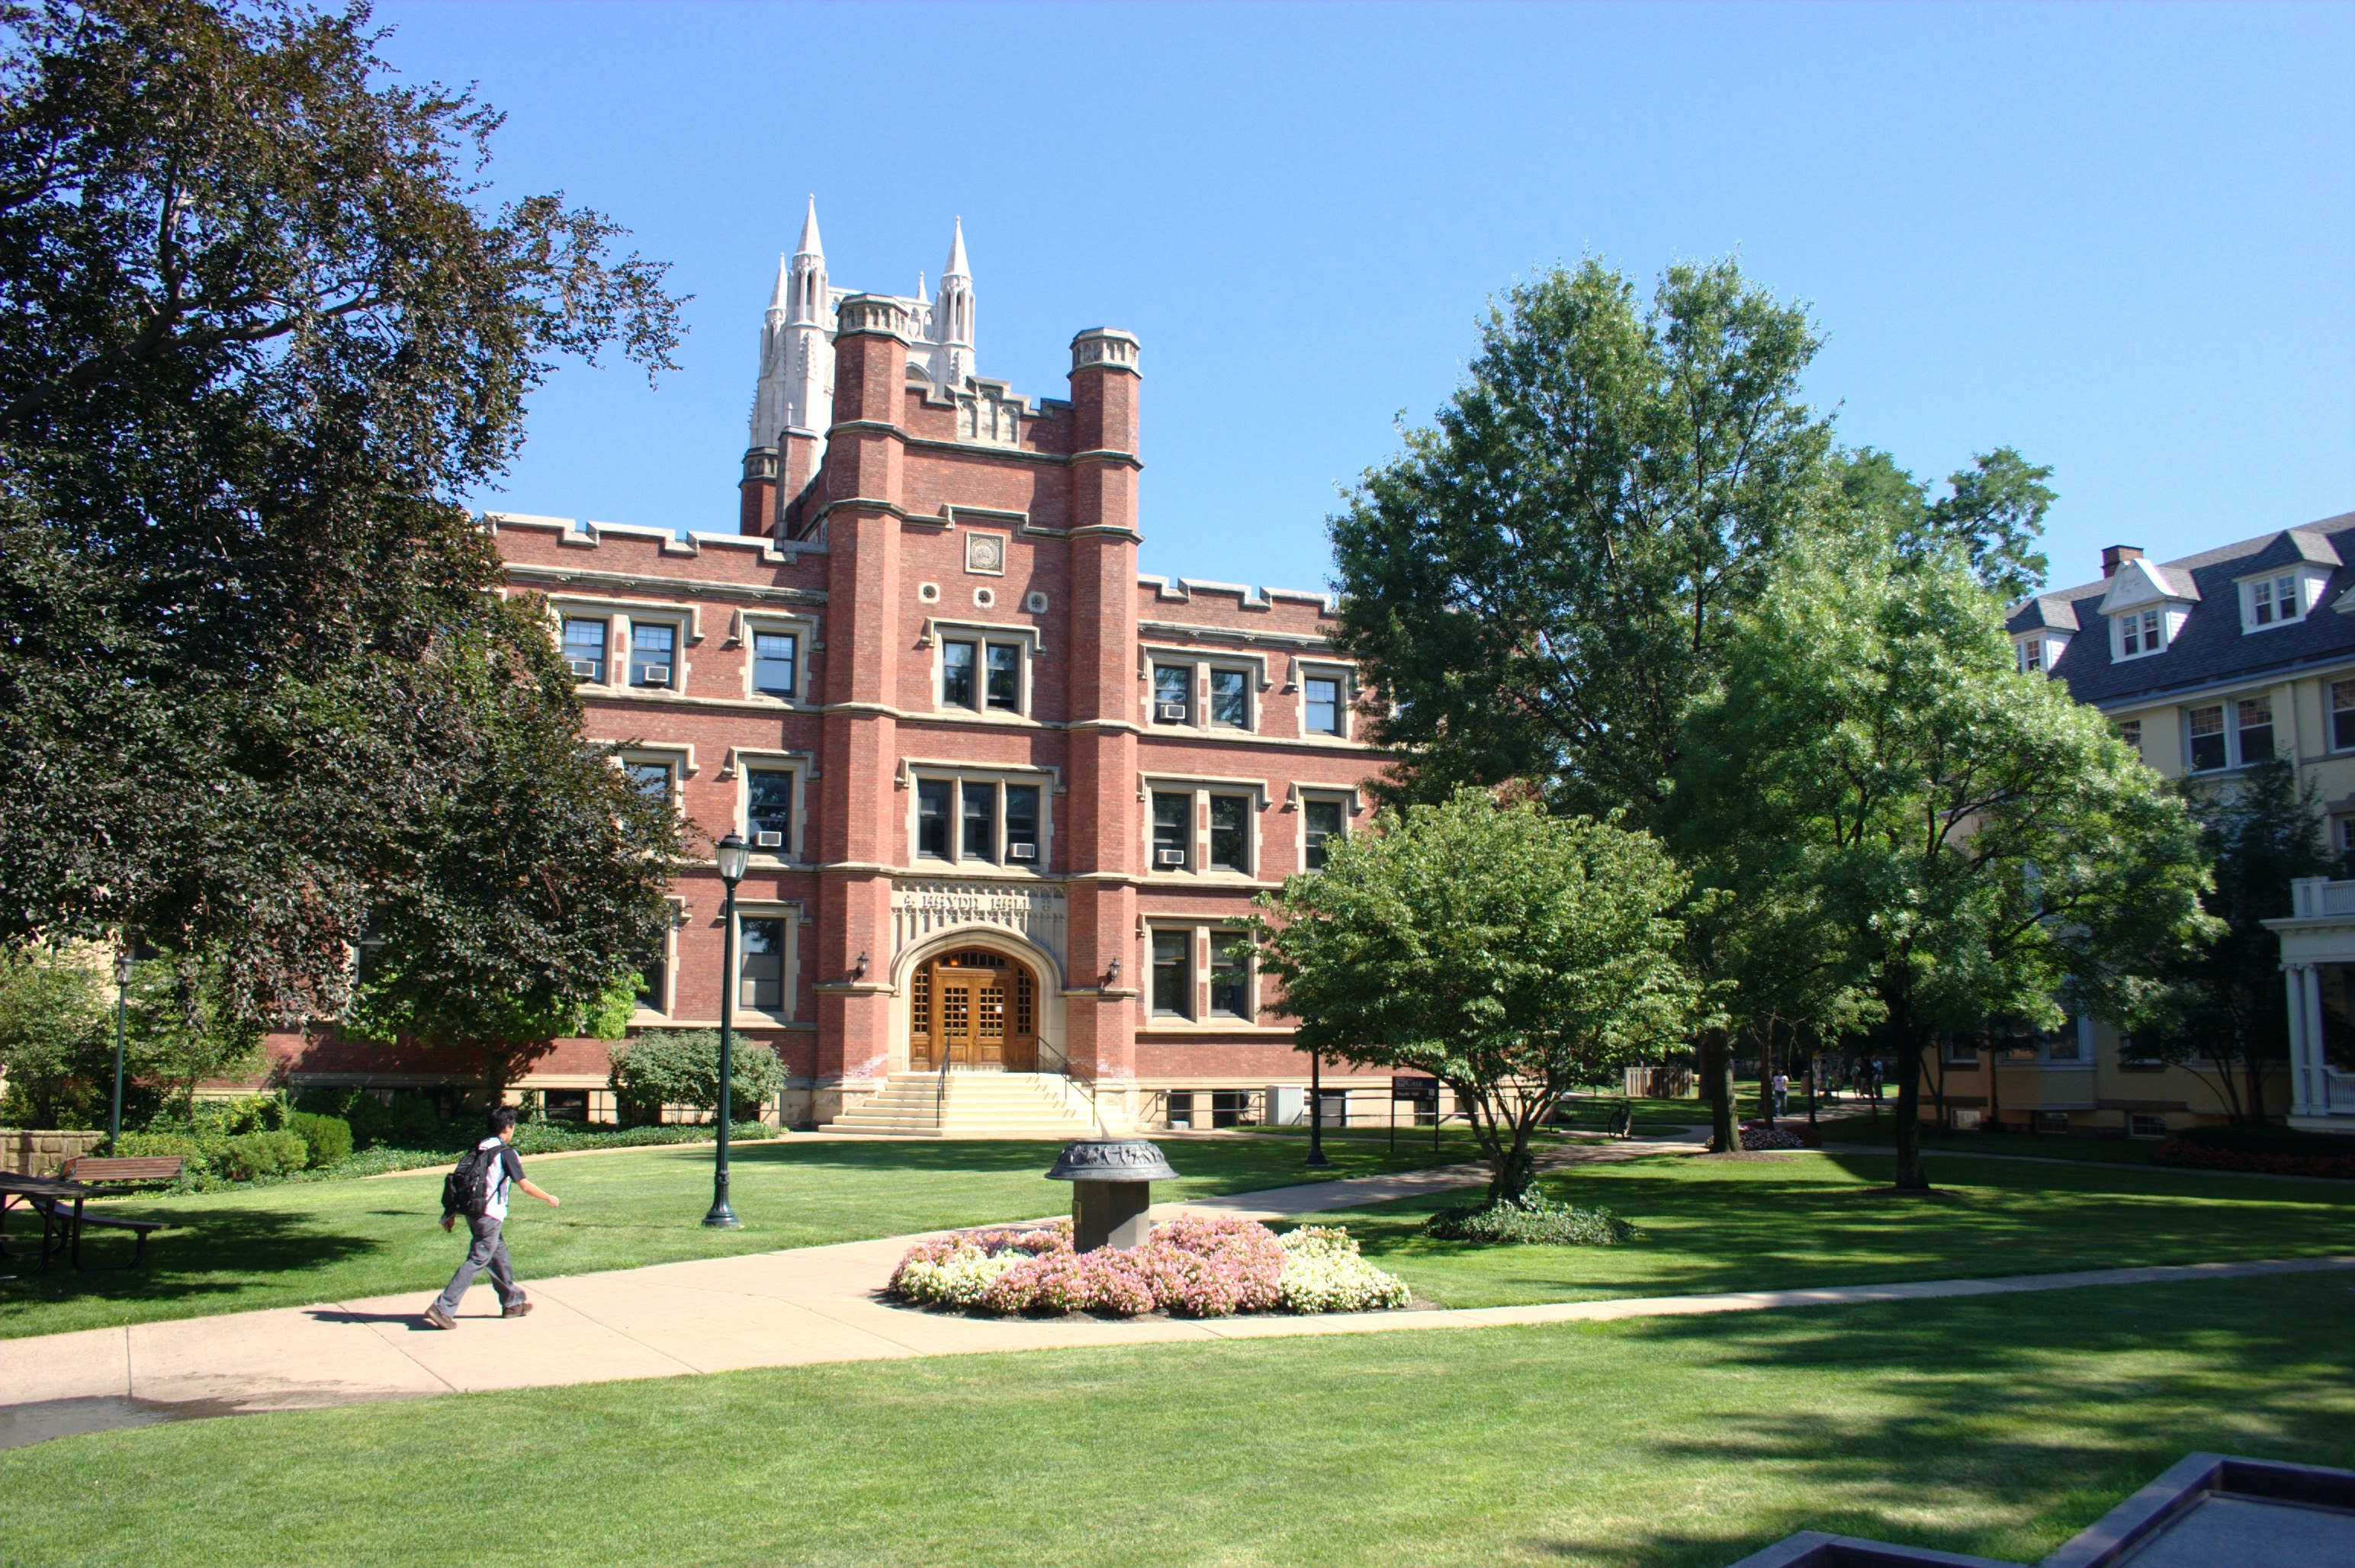 image of Case Western Reserve University